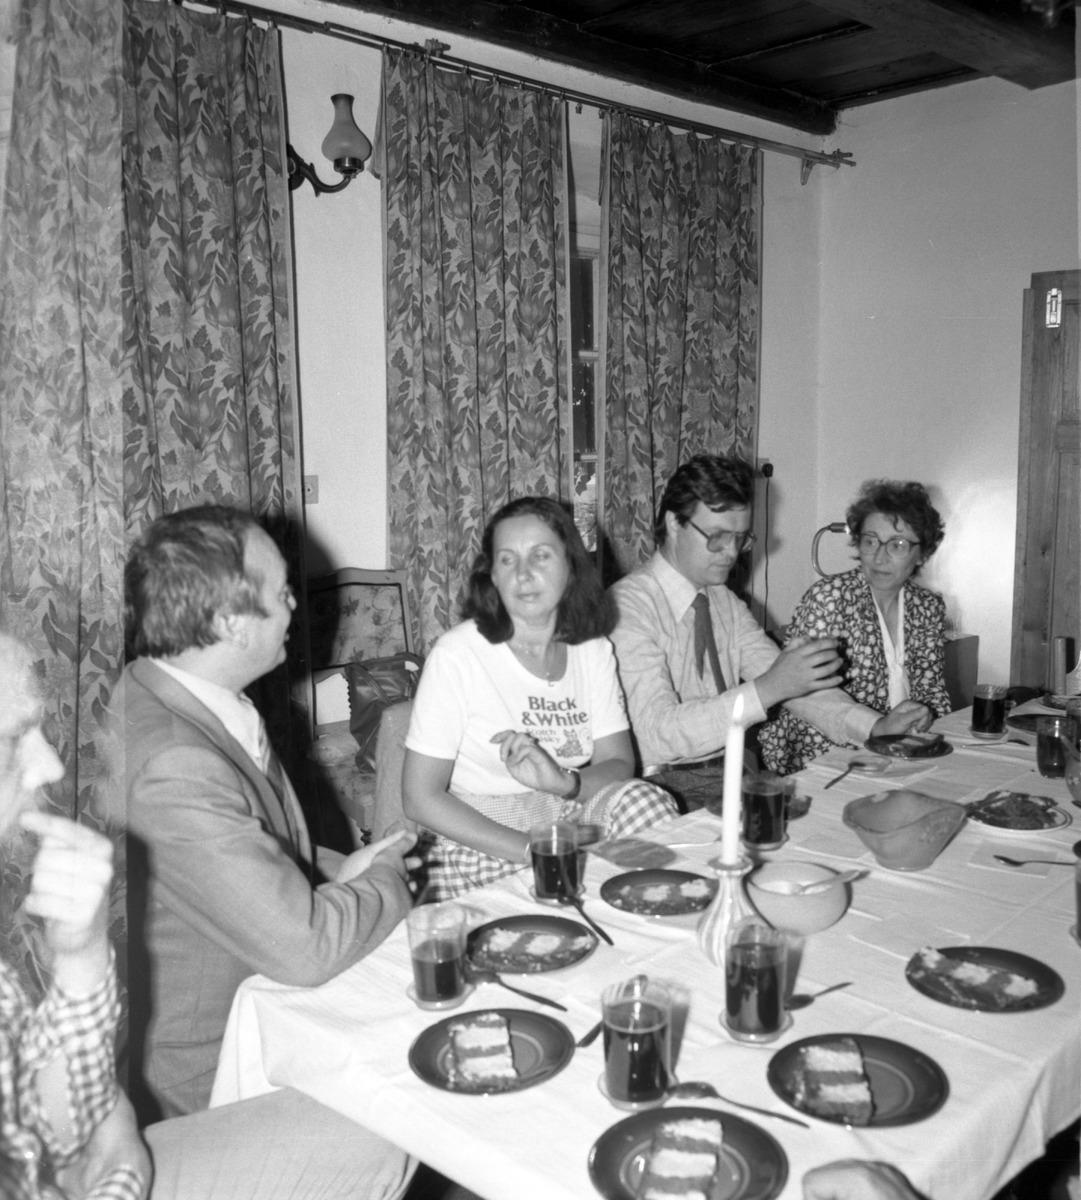 43-lecie TMZG, 1987 r.  [8]